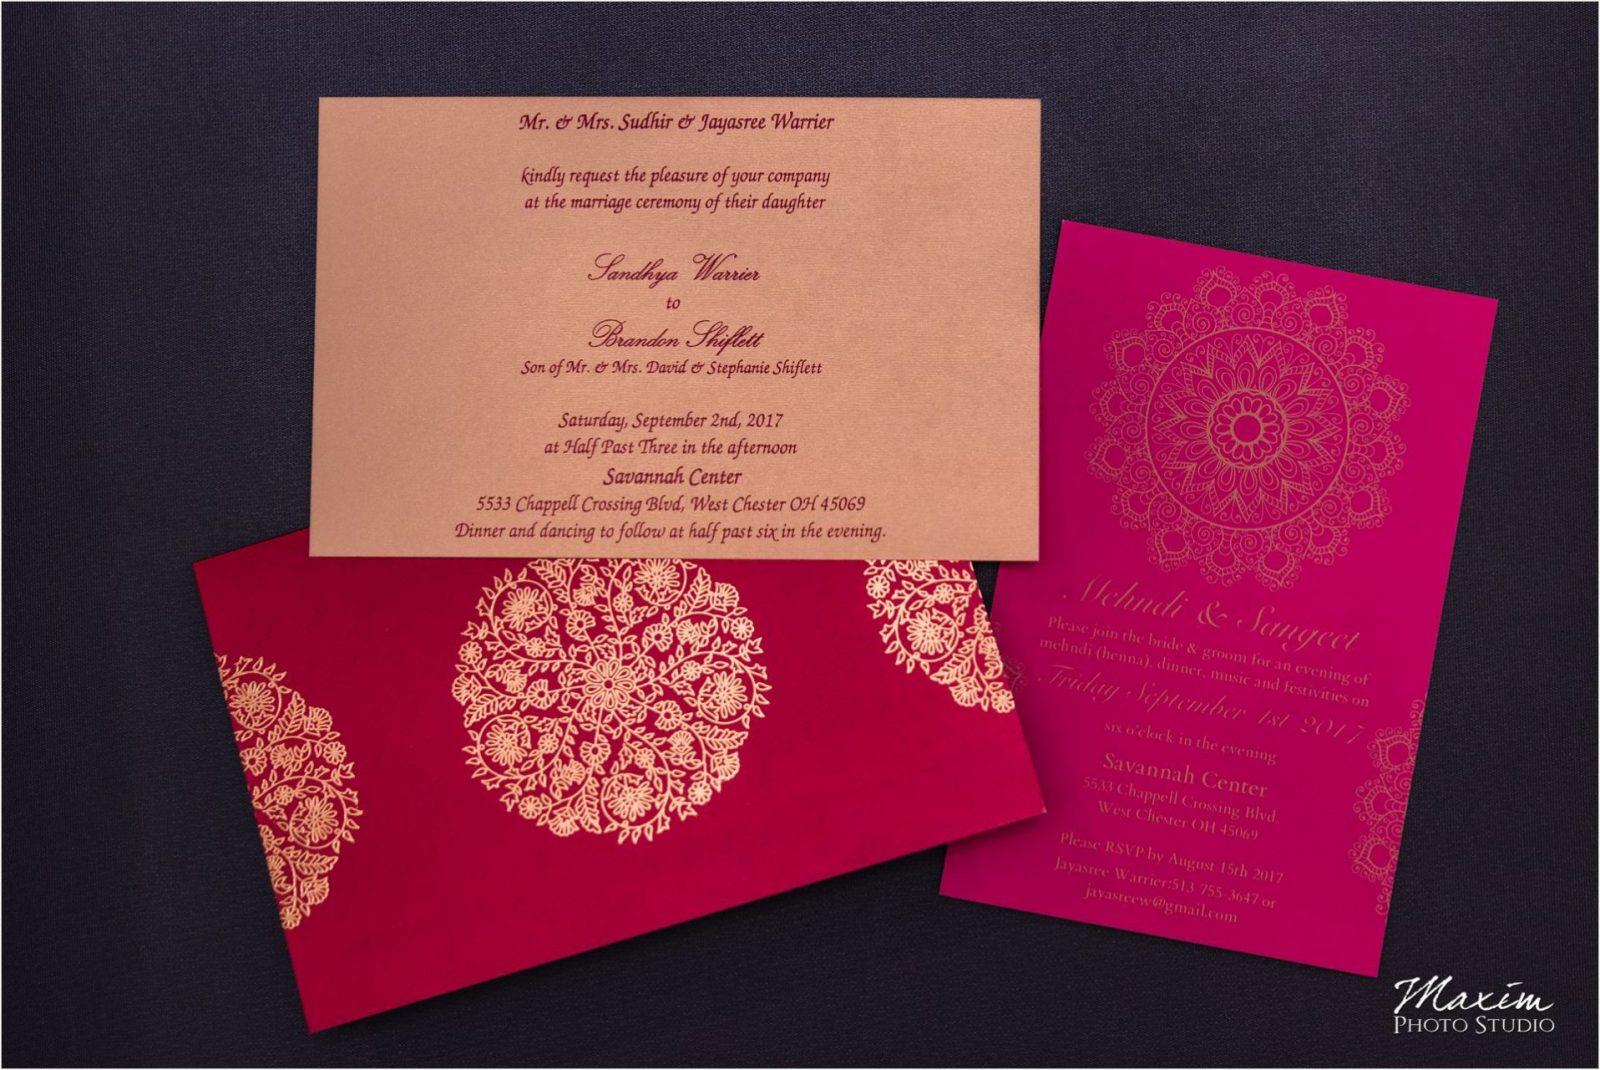 Savannah Center Indian Wedding announcement